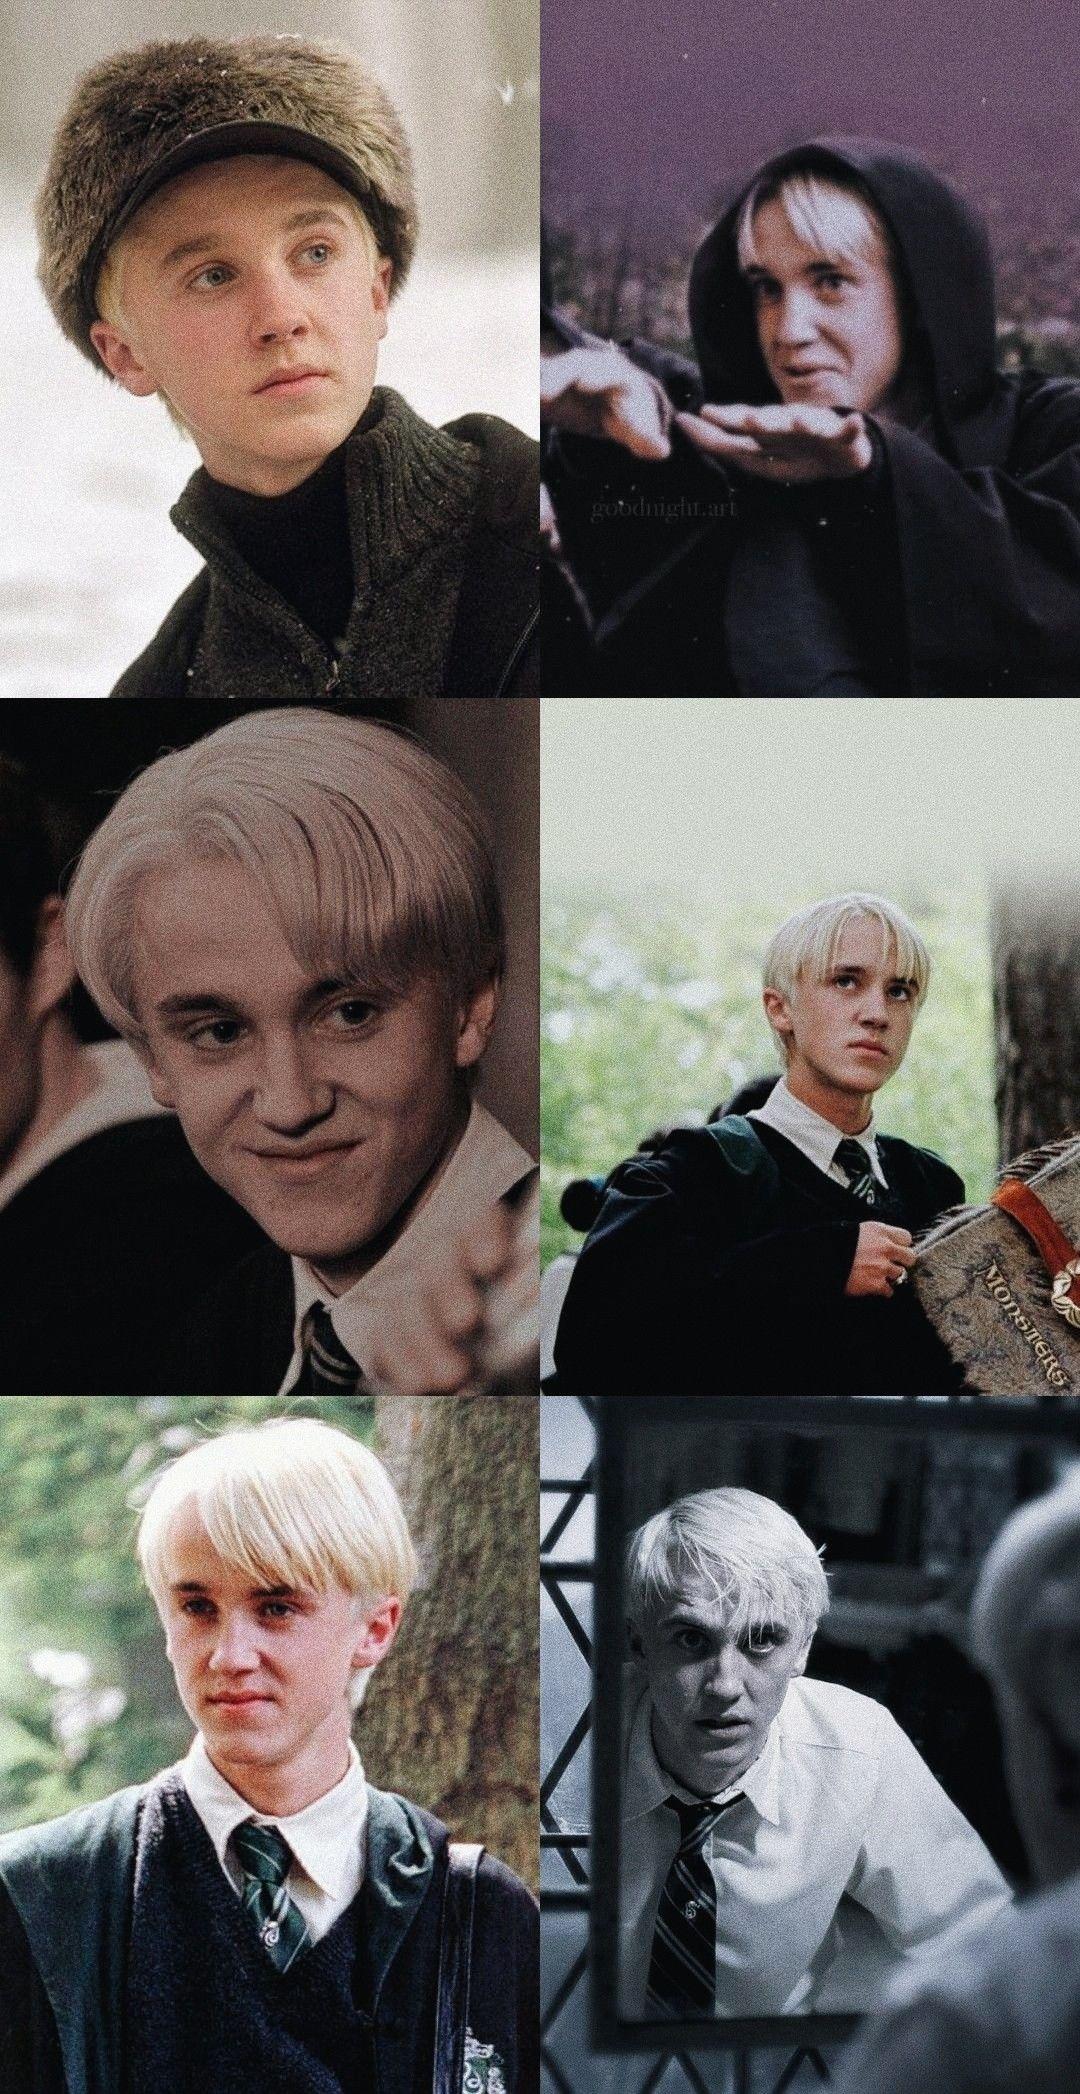 Draco Malfoy Wallpaper In 2020 Draco Harry Potter Draco Malfoy Harry Potter Draco Malfoy